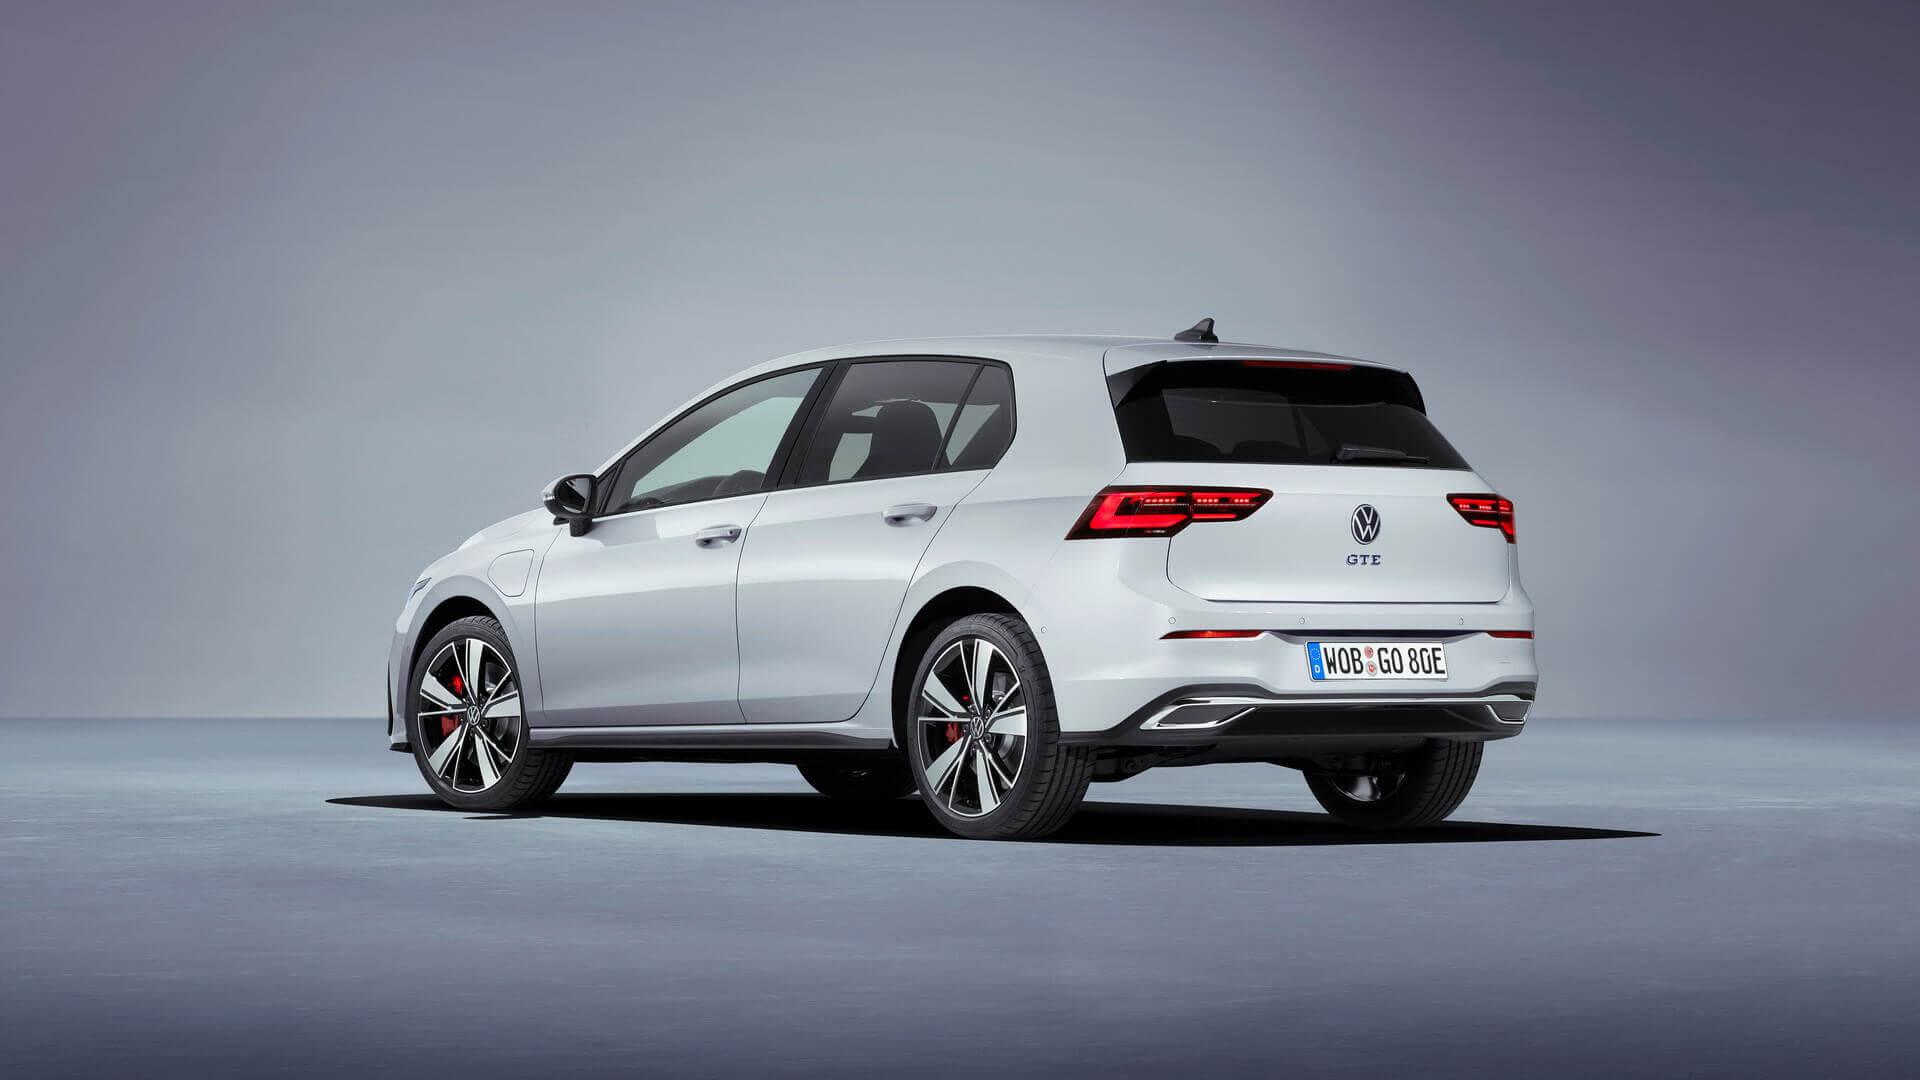 Плагин-гибрид VW Golf GTE 2020